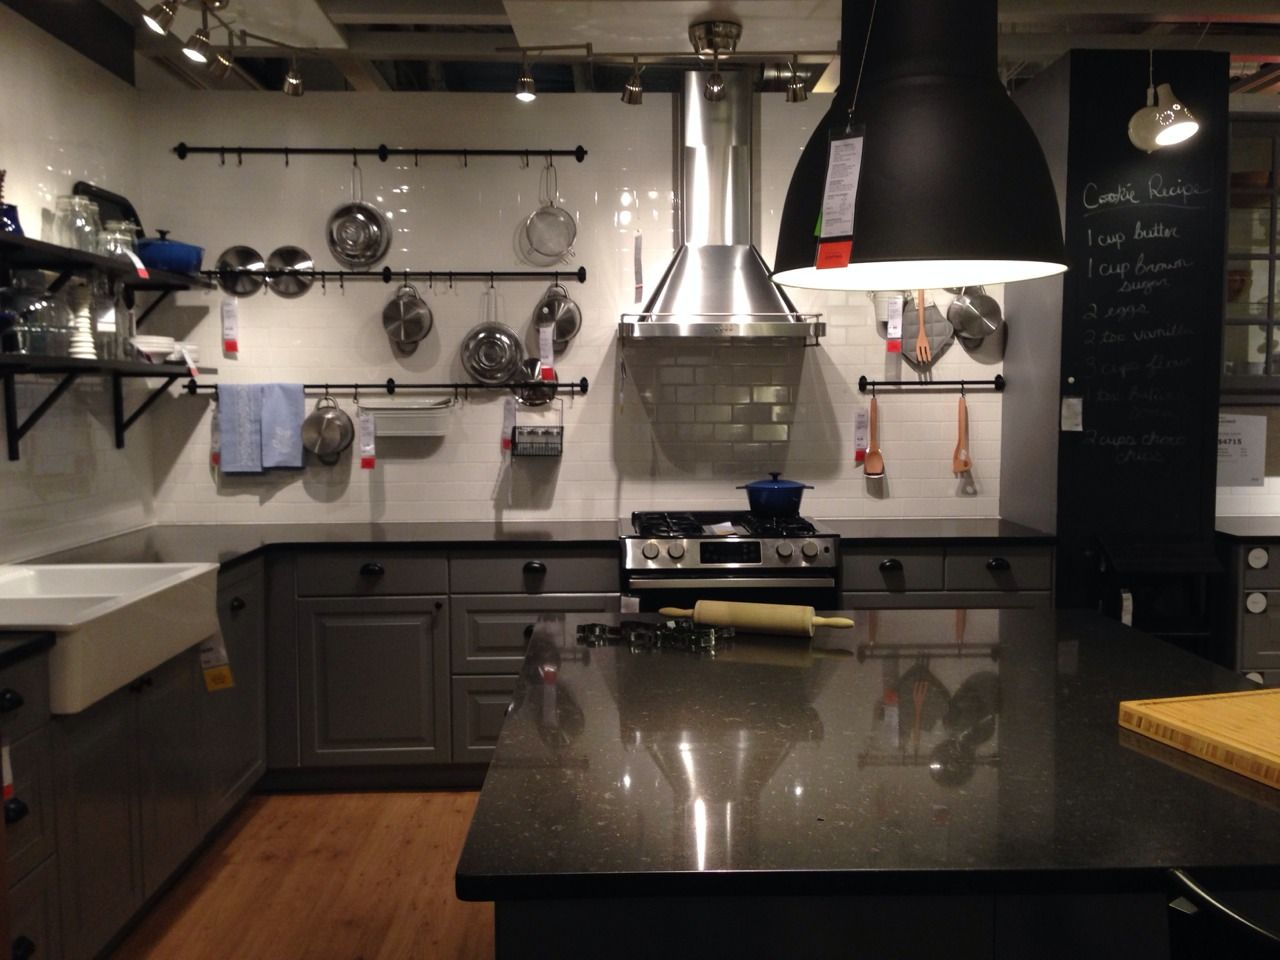 Ikea trip kitchen ideas my future home pinterest kitchens